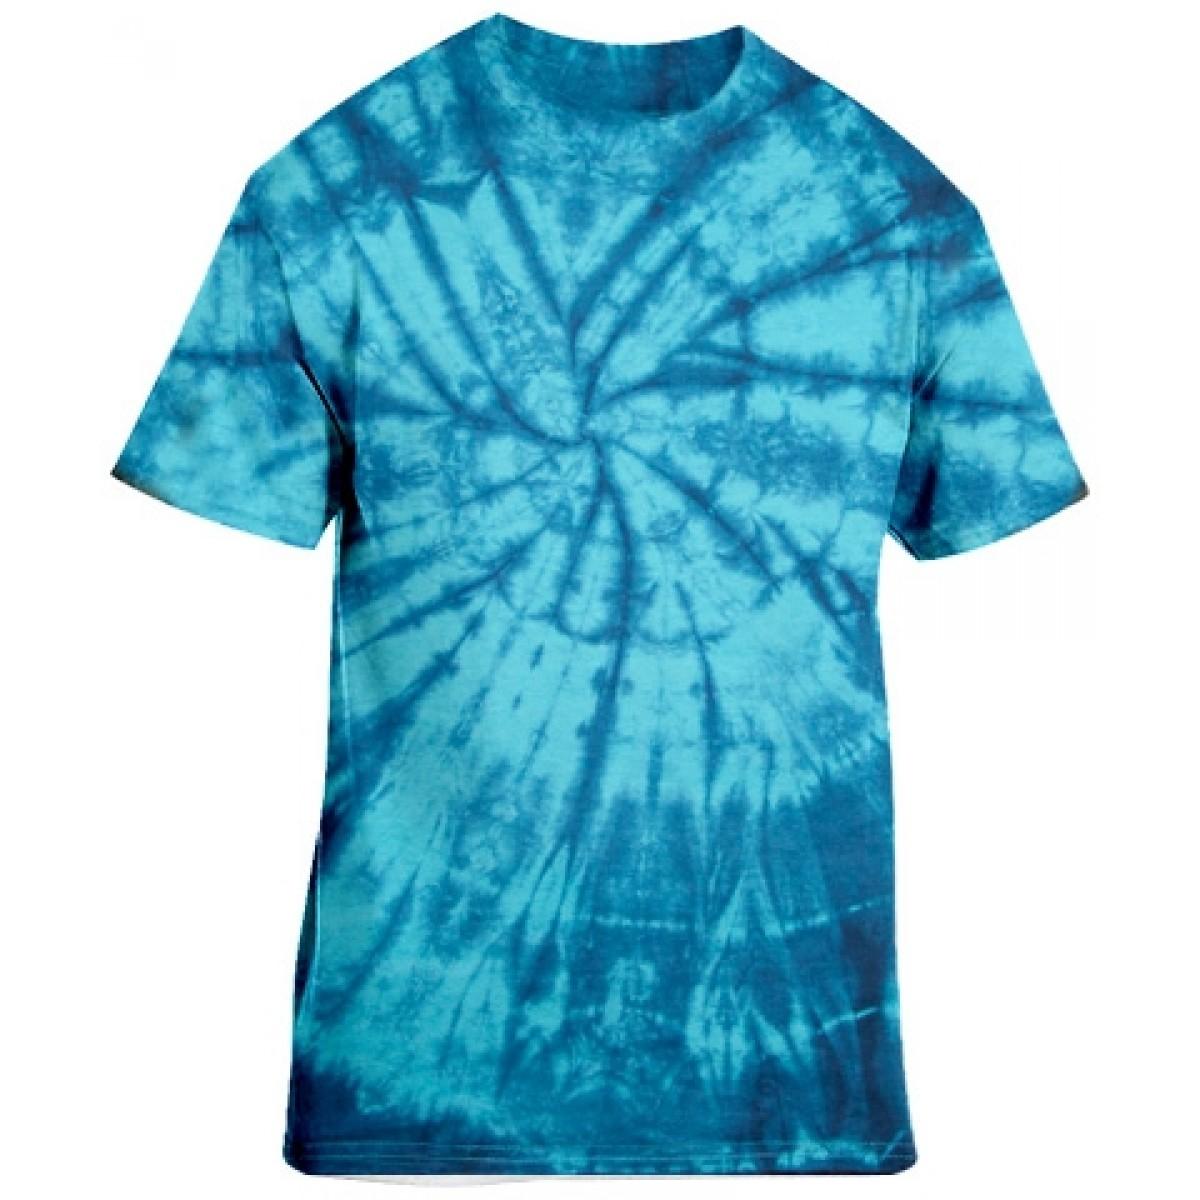 Tie-Dye Blue Short Sleeve-Blue-YM